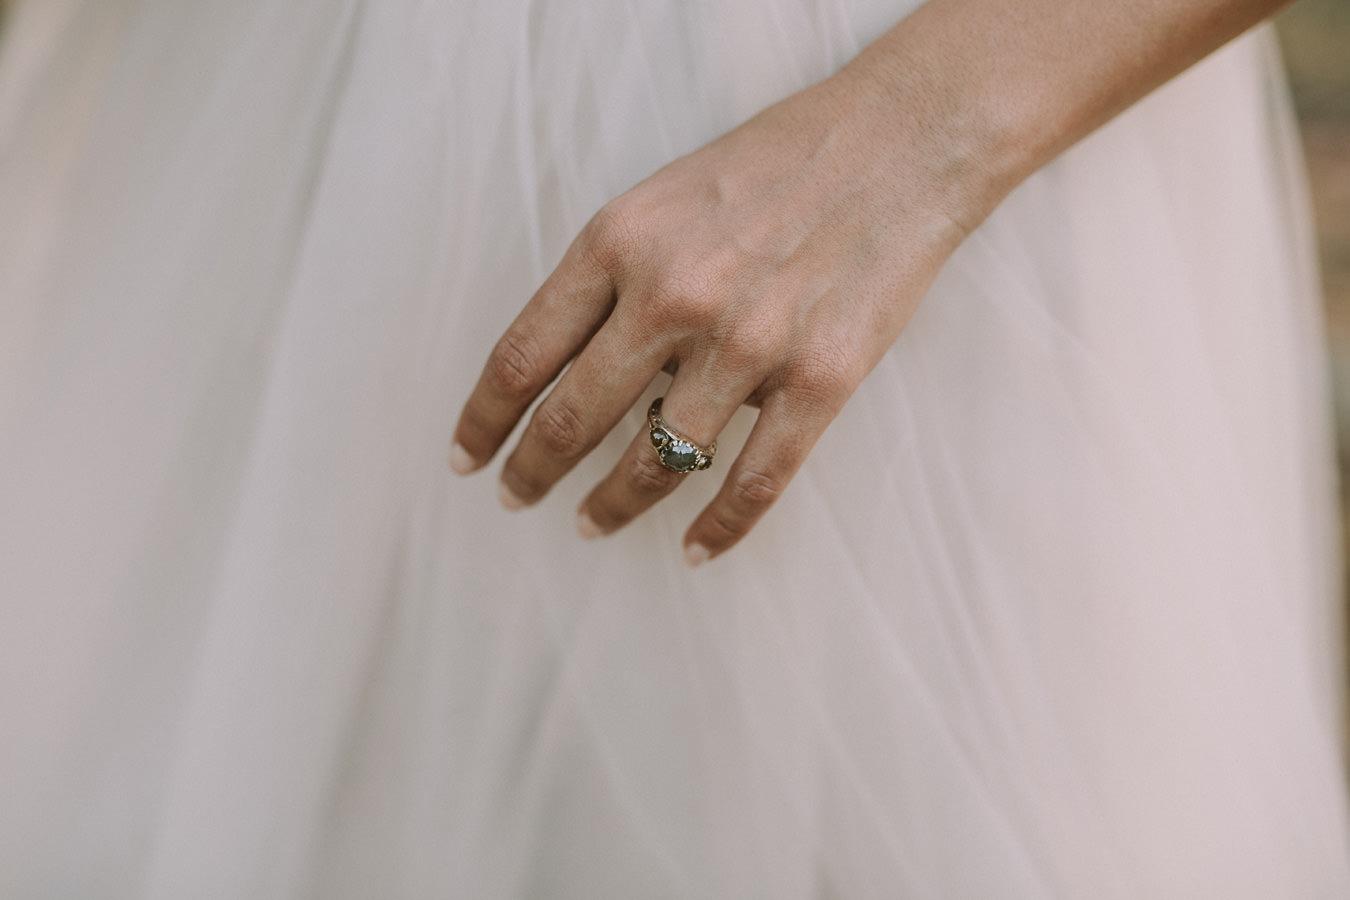 035-destinasjonsbryllup-bryllup-i-utlandet-tone-tvedt.jpg